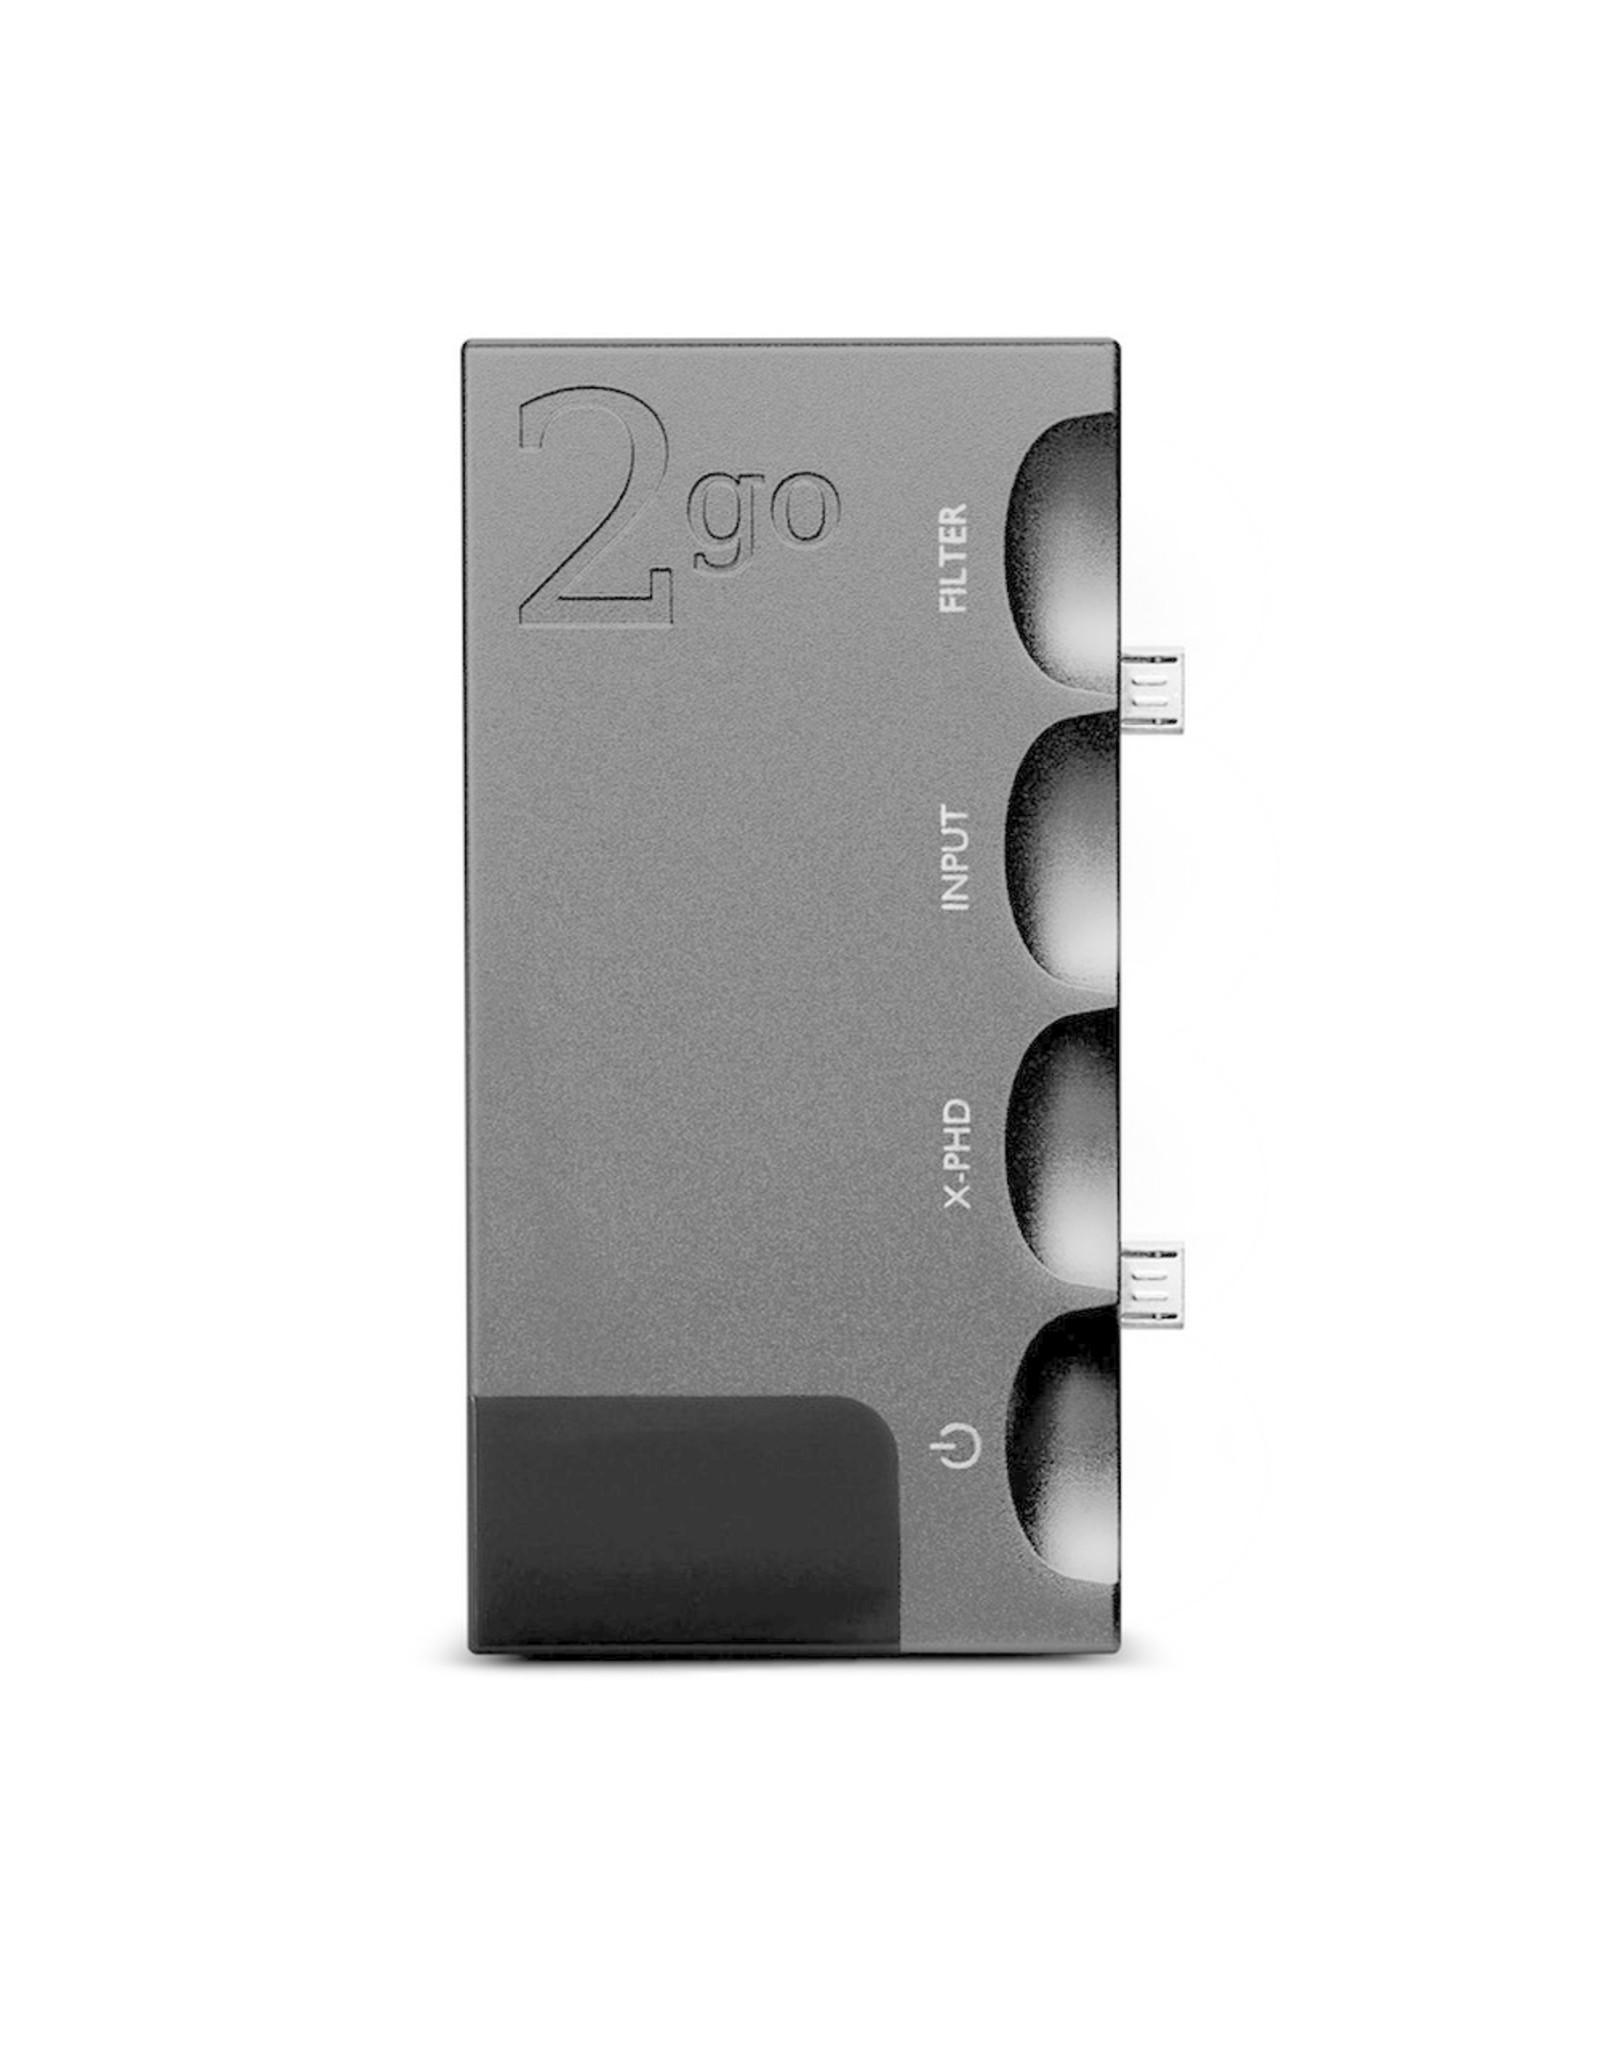 Chord Electronics Chord Electronics 2go Music Streamer/Player For Hugo 2